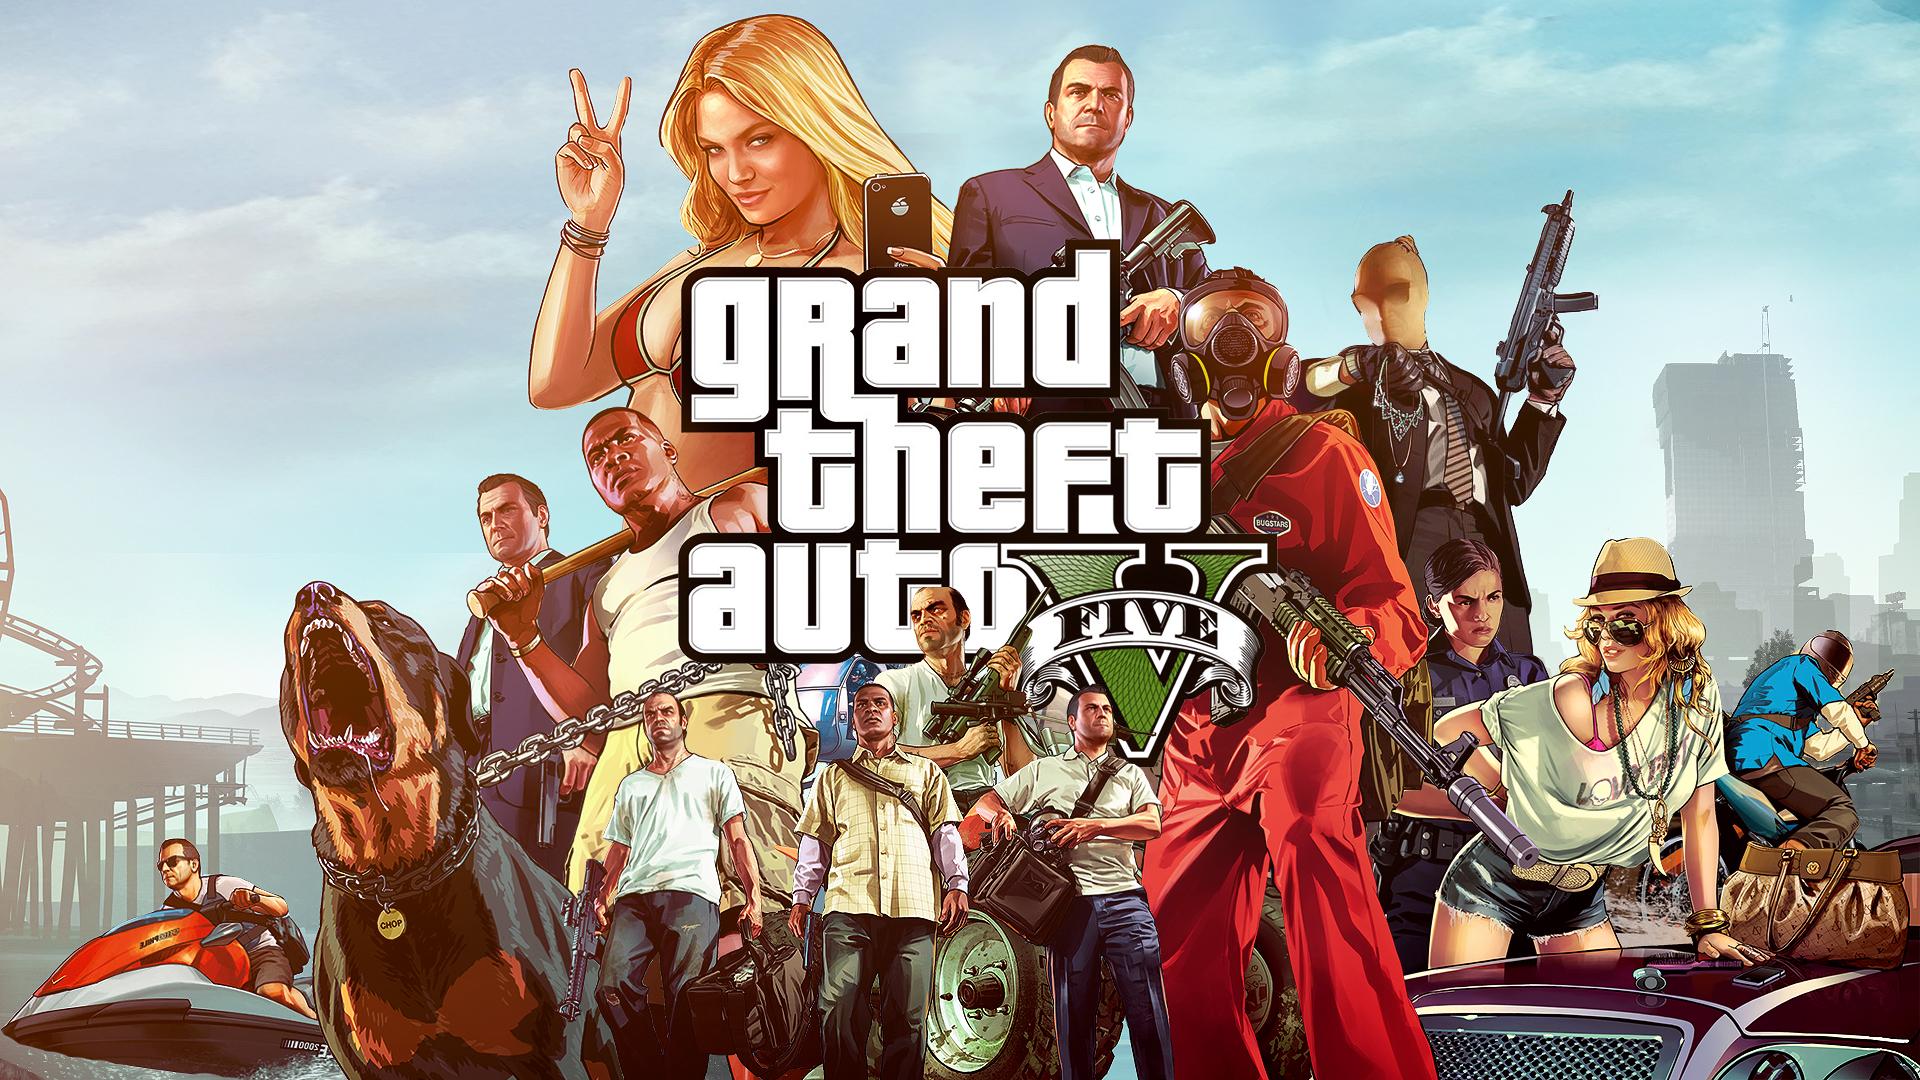 GTA Vice City Cheat Code: PC, Play station